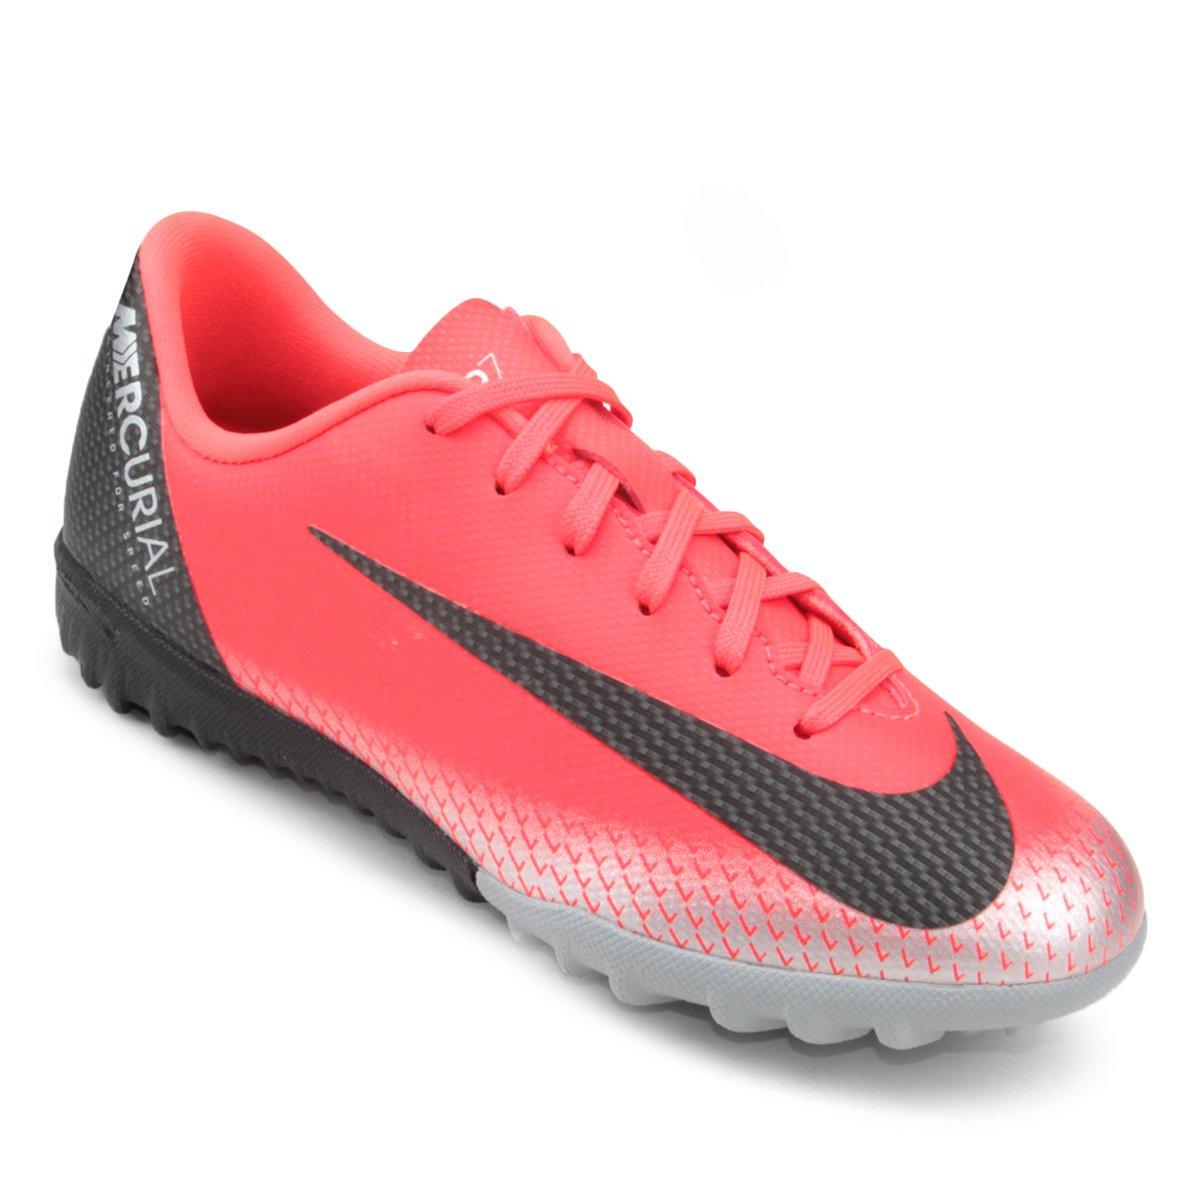 95e15c65f5 Chuteira Society Infantil Nike Mercurial Vapor 12 Academy GS CR7 TF ...